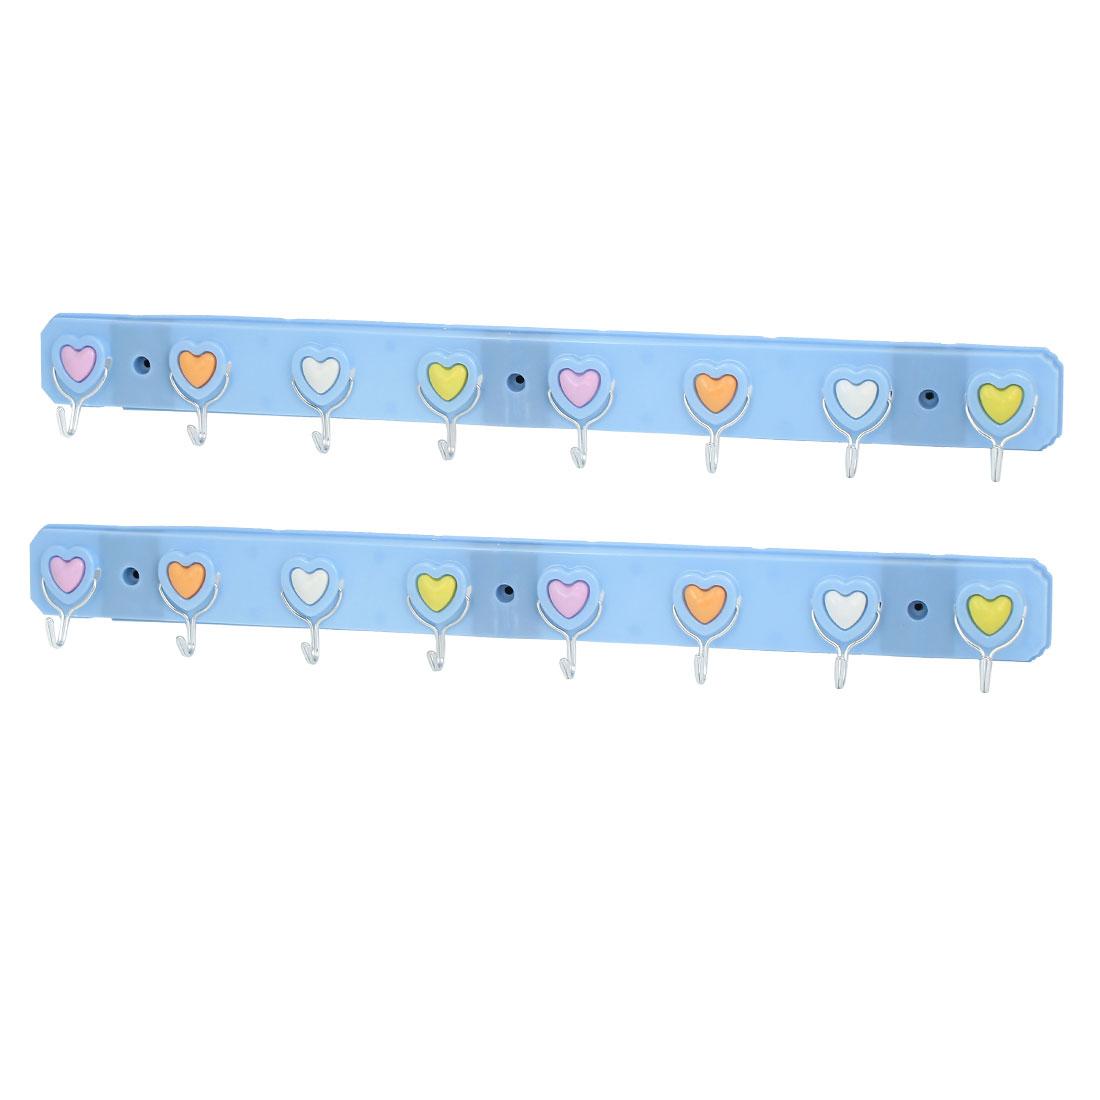 Bedroom Bathroom Hat Clothes Towel Heart Pattern Wall Mounted Self Adhesive 8-Hooks Plastic Hanger Rack Holder Blue 2Pcs